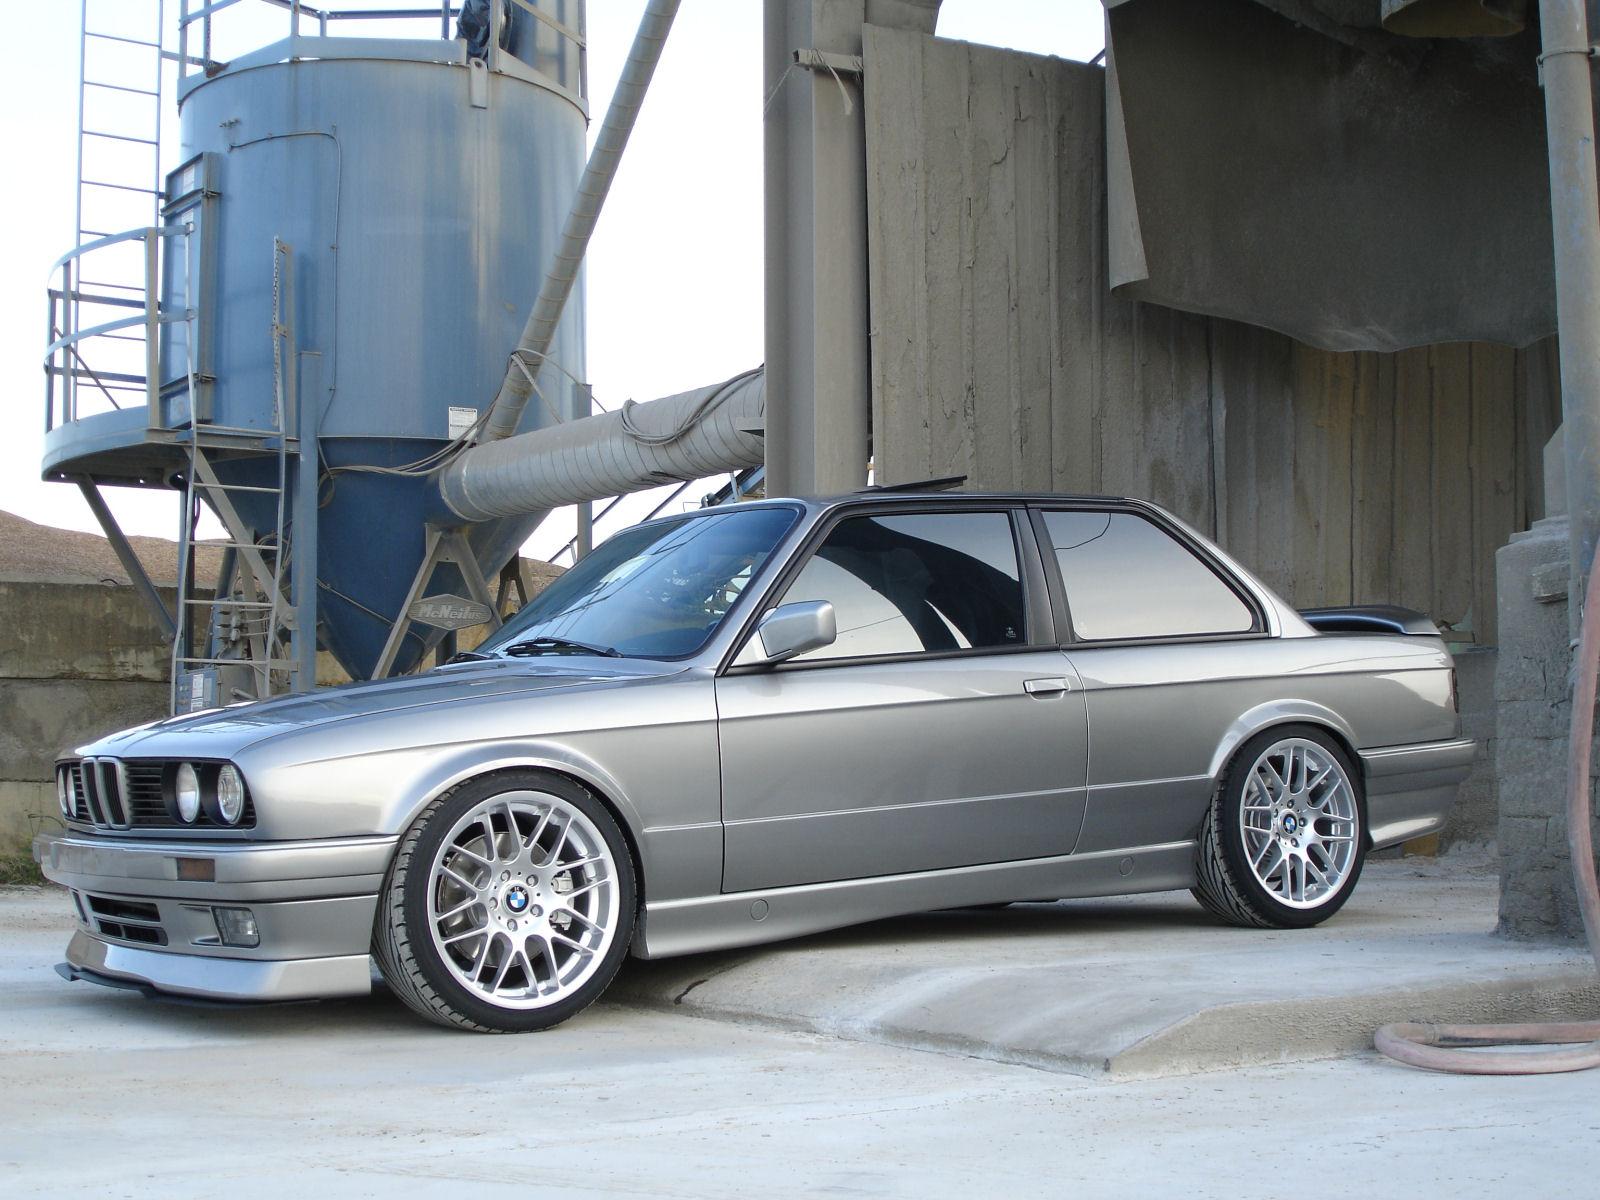 Premier Tuning BMW Premier Tuning